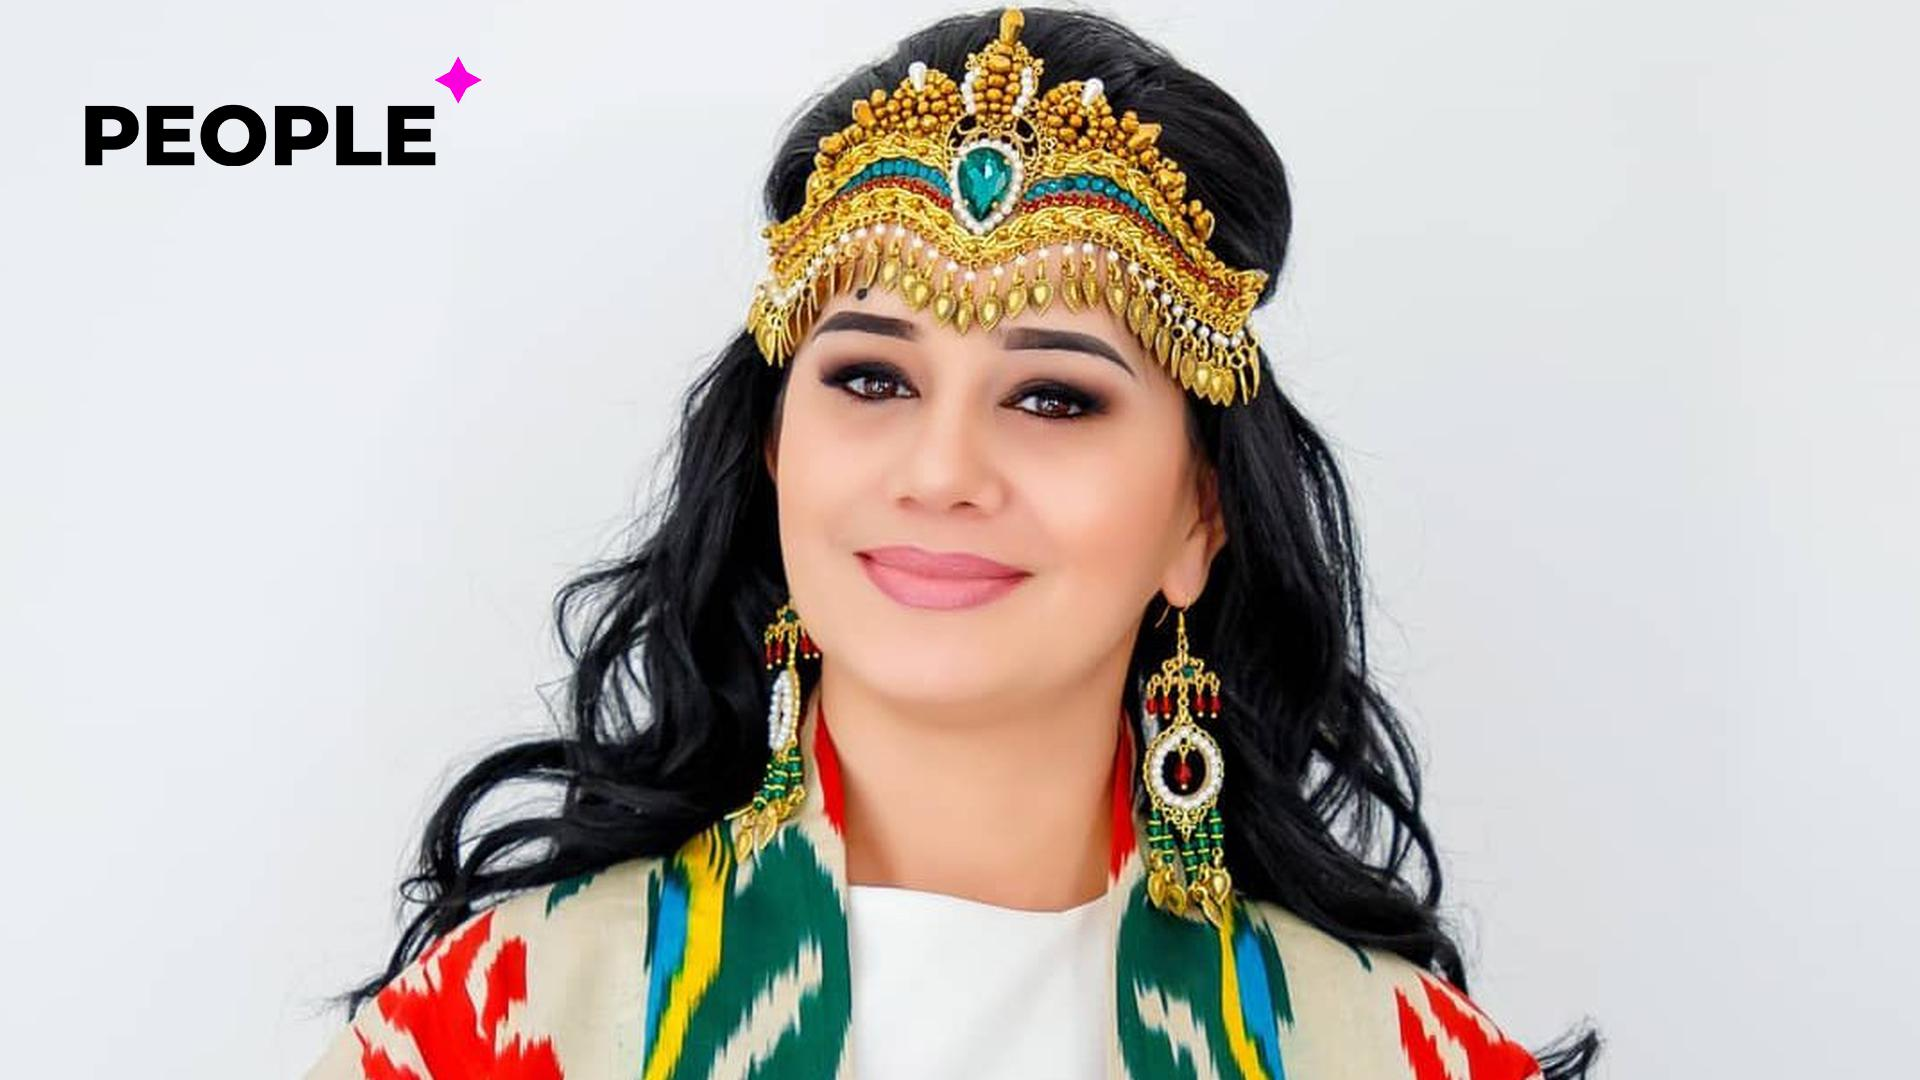 Наргиза Абдуллаева призналась, что стала актрисой случайно